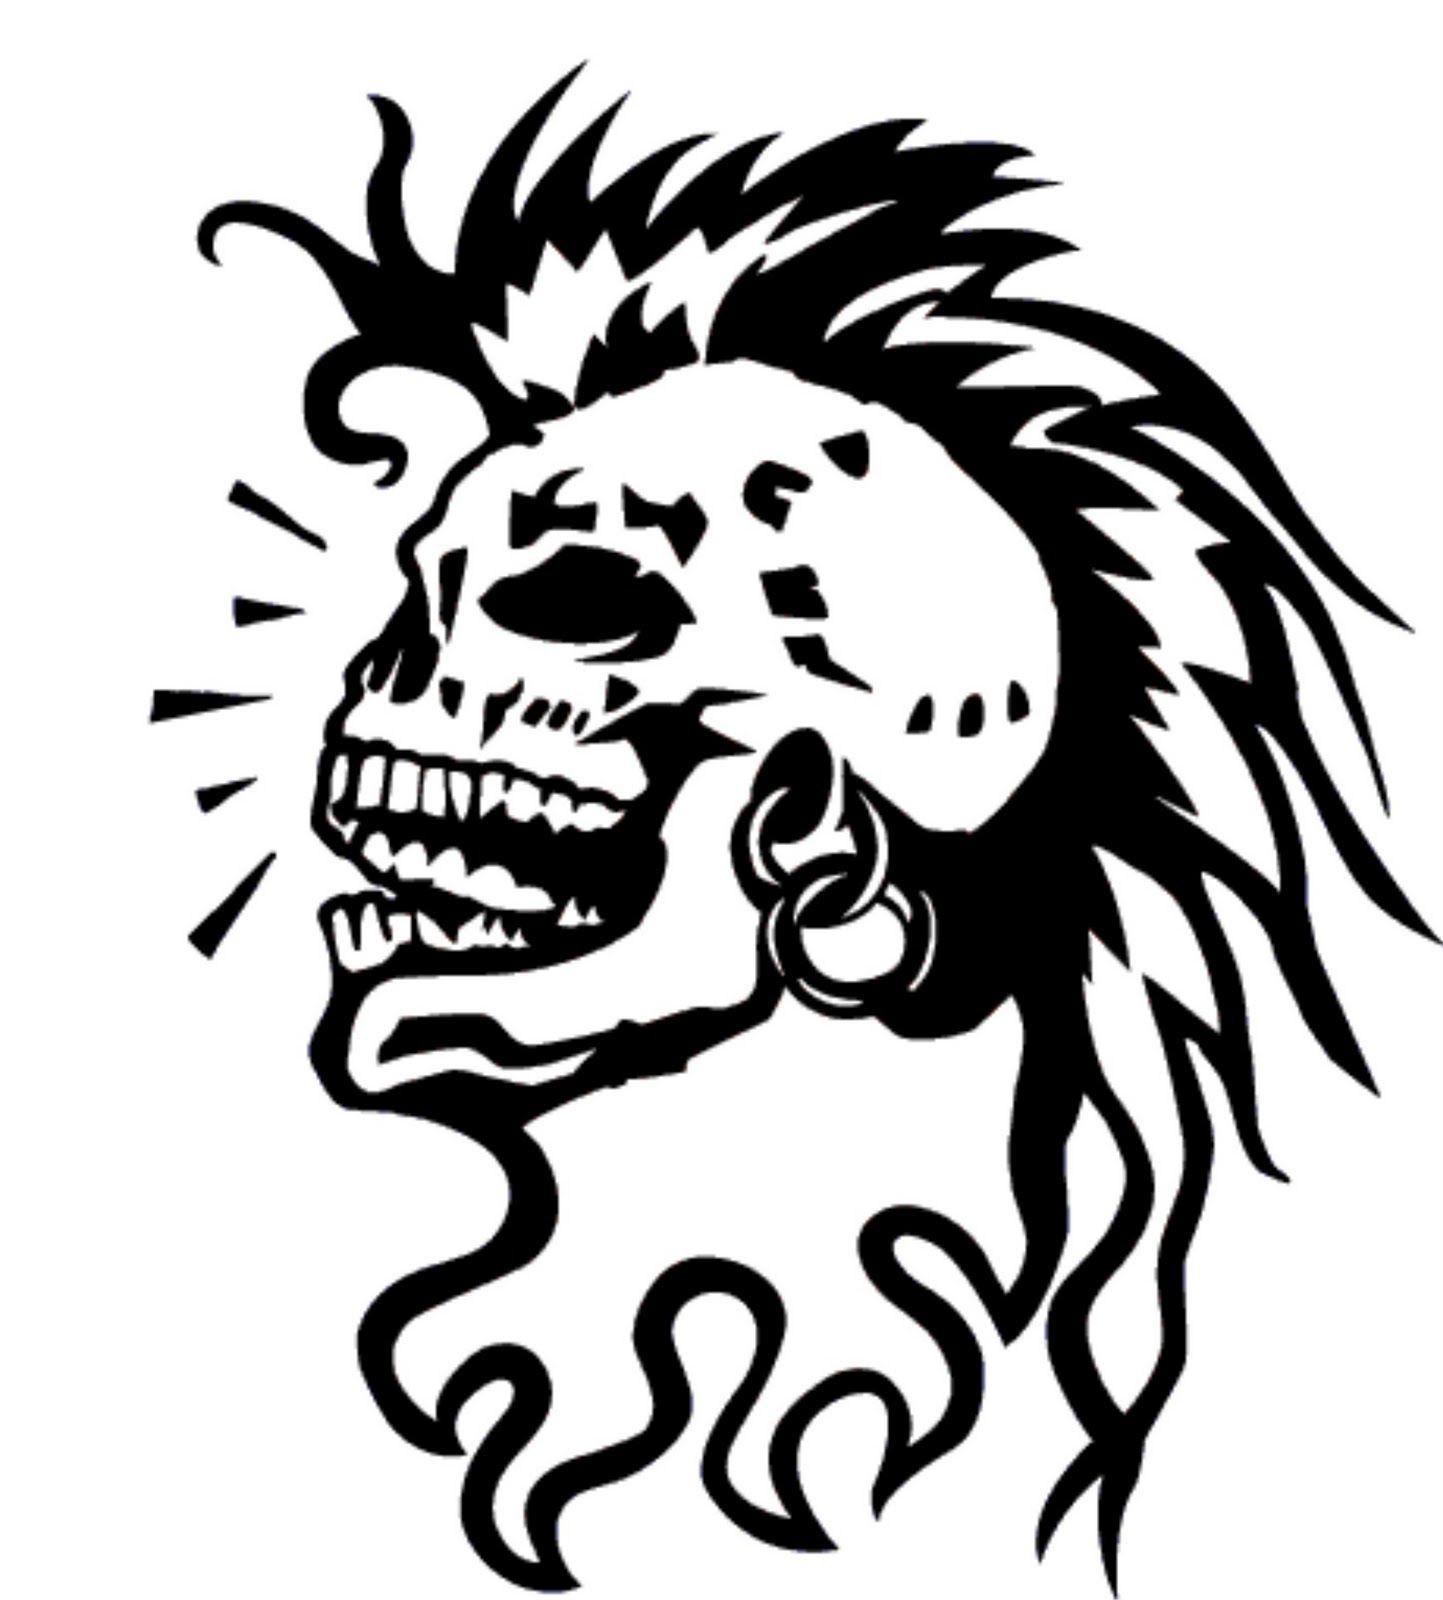 Henna Tattoo Design Tribal: Simple Henna Tribal Tattoo Designs